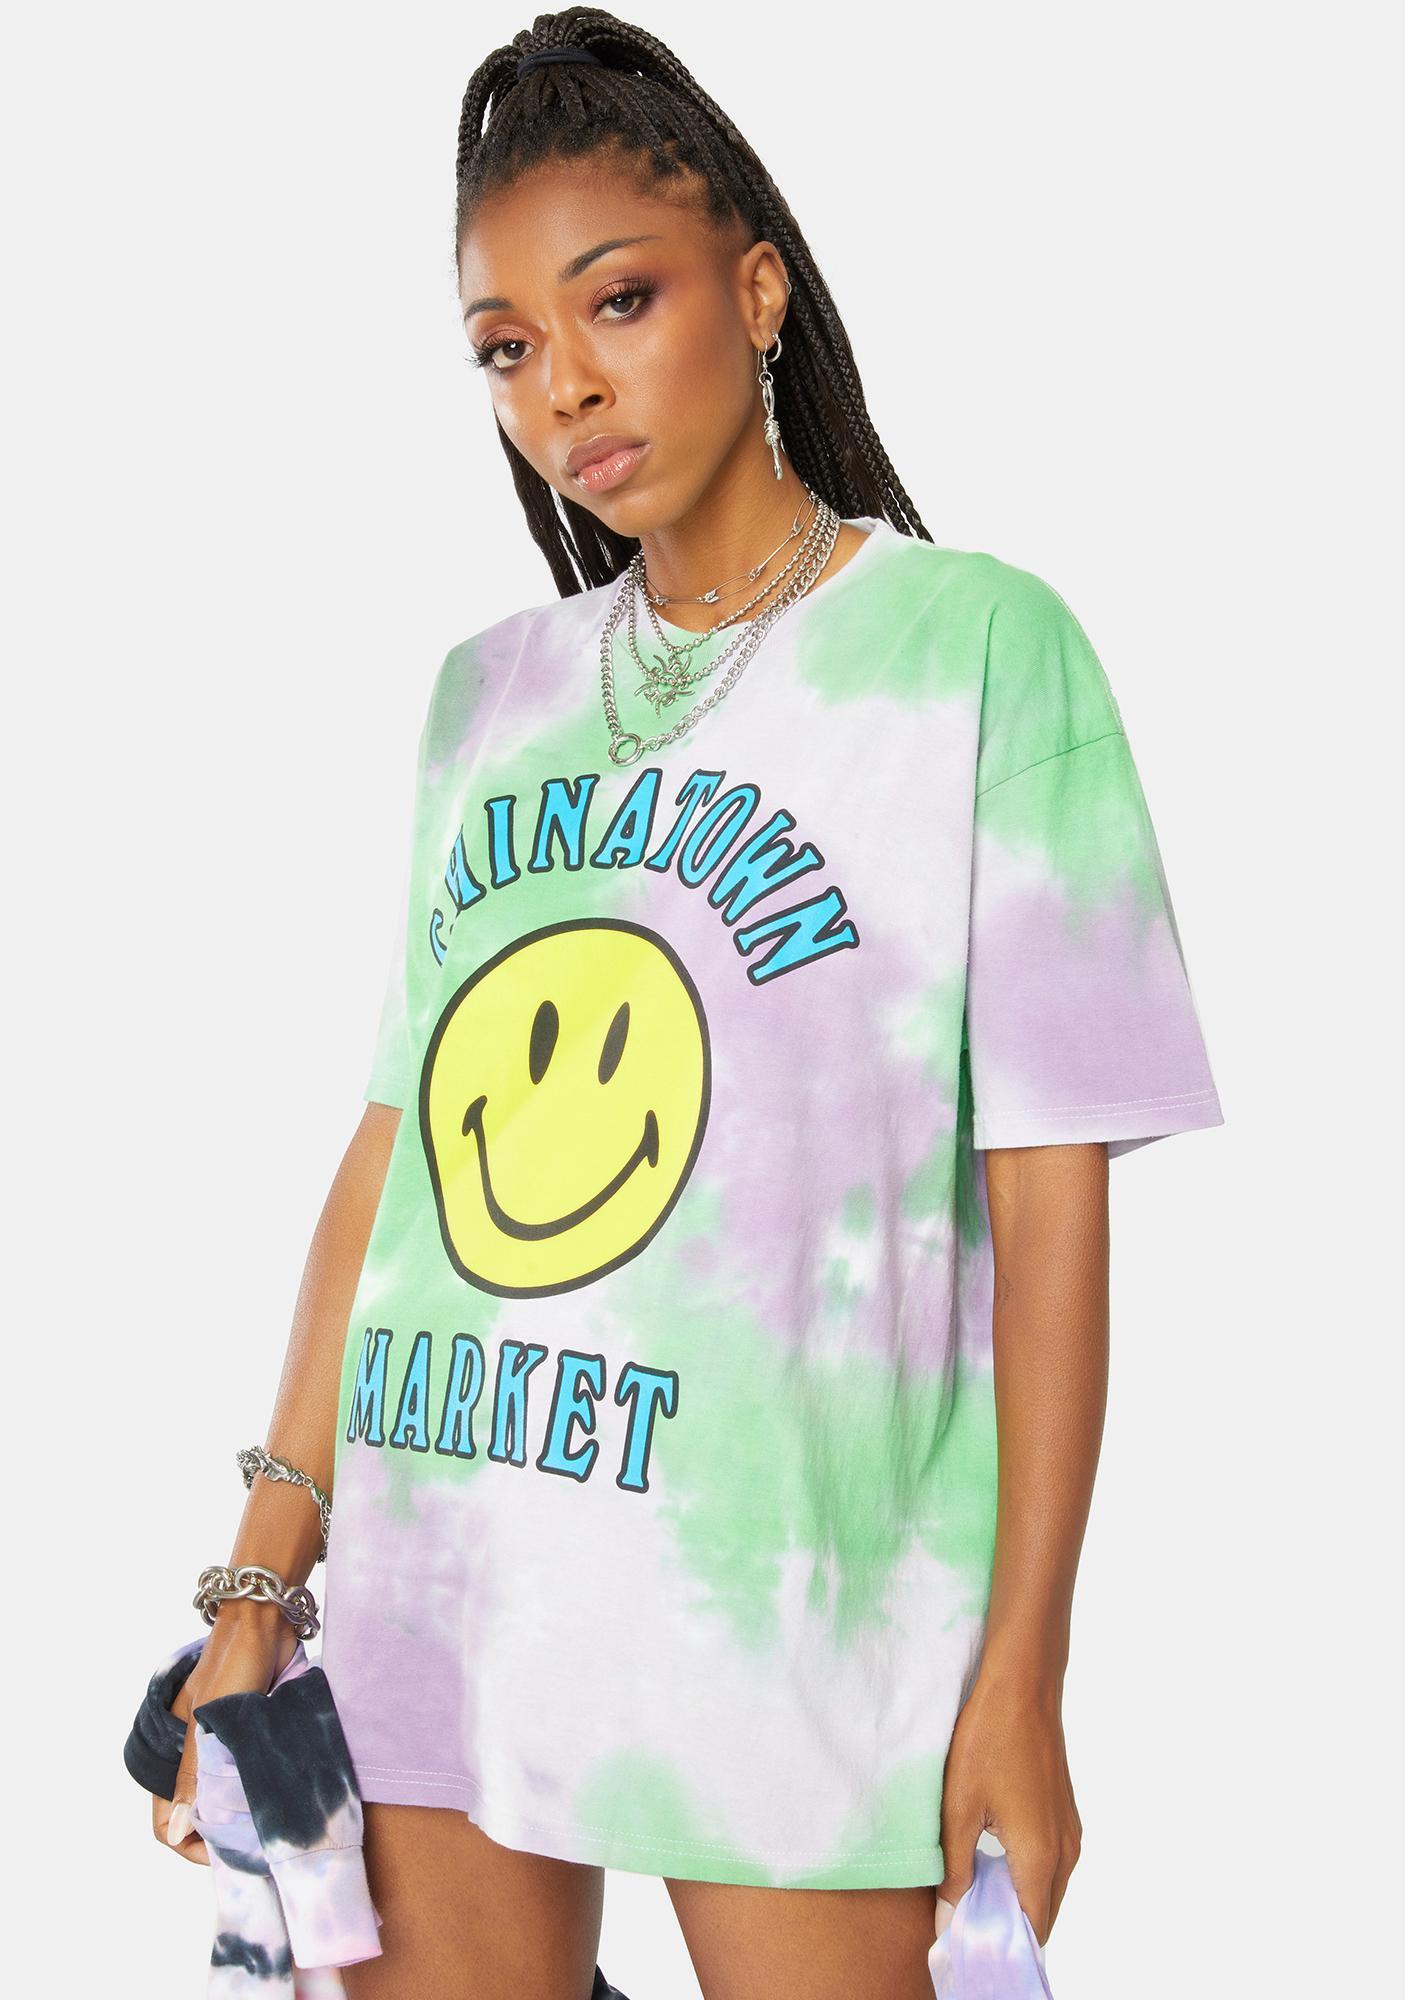 CHINATOWN MARKET Smiley Multi Tie Dye Graphic Tee